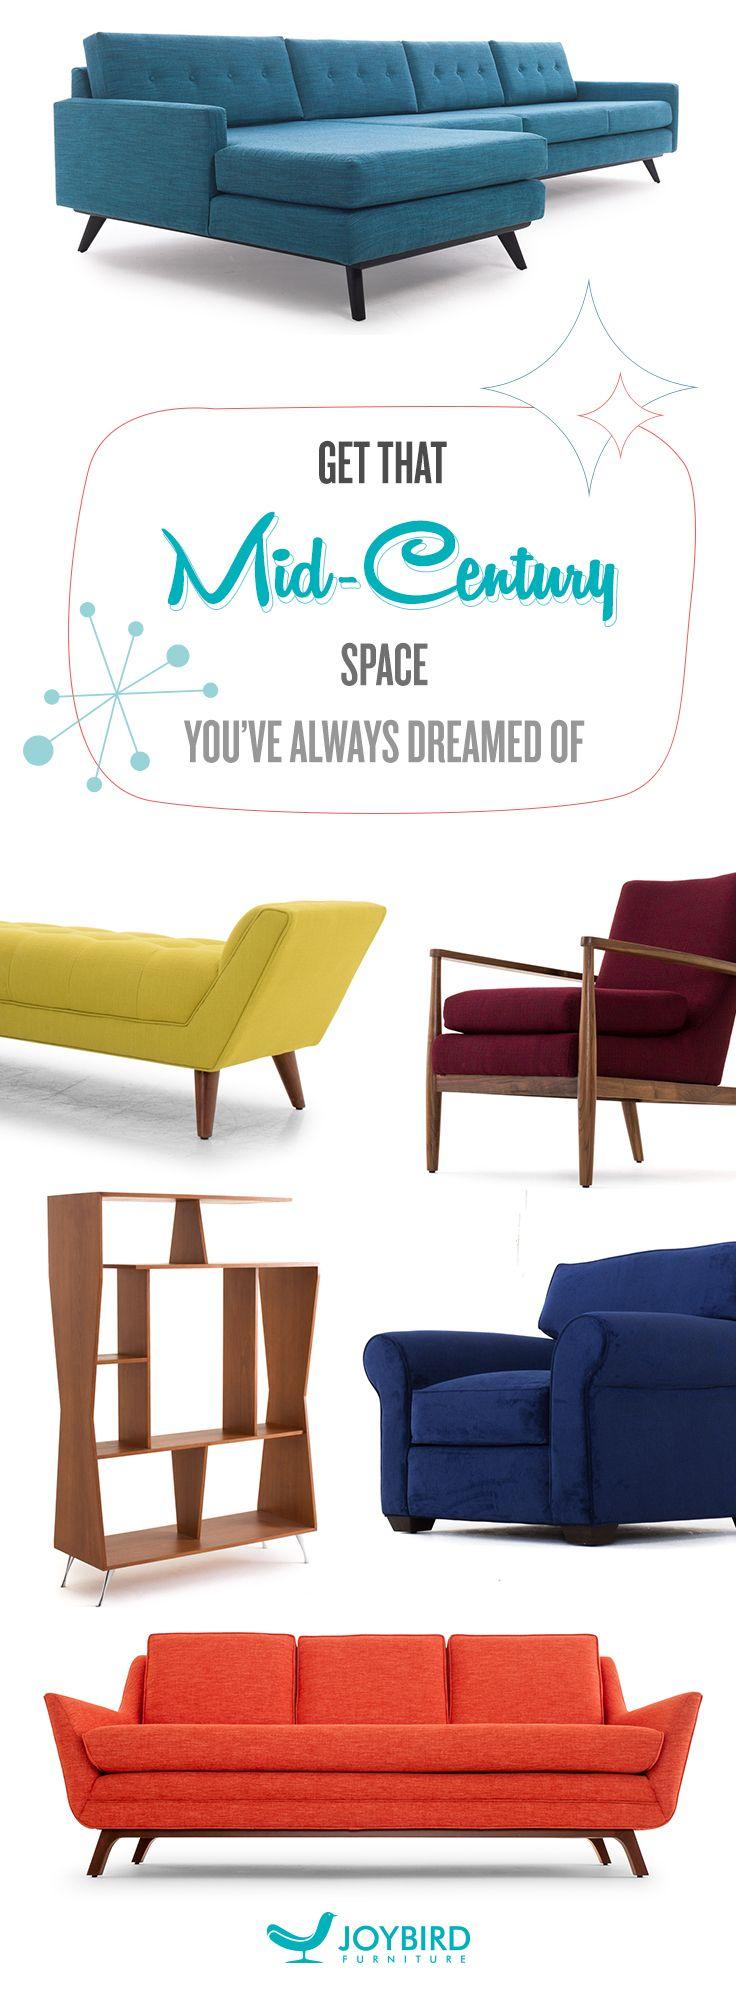 Modern light blue leather swivel lounge chair dove midcentury - 94 Best Mid Century Upholstery Images On Pinterest Upholstery Chairs And Mid Century